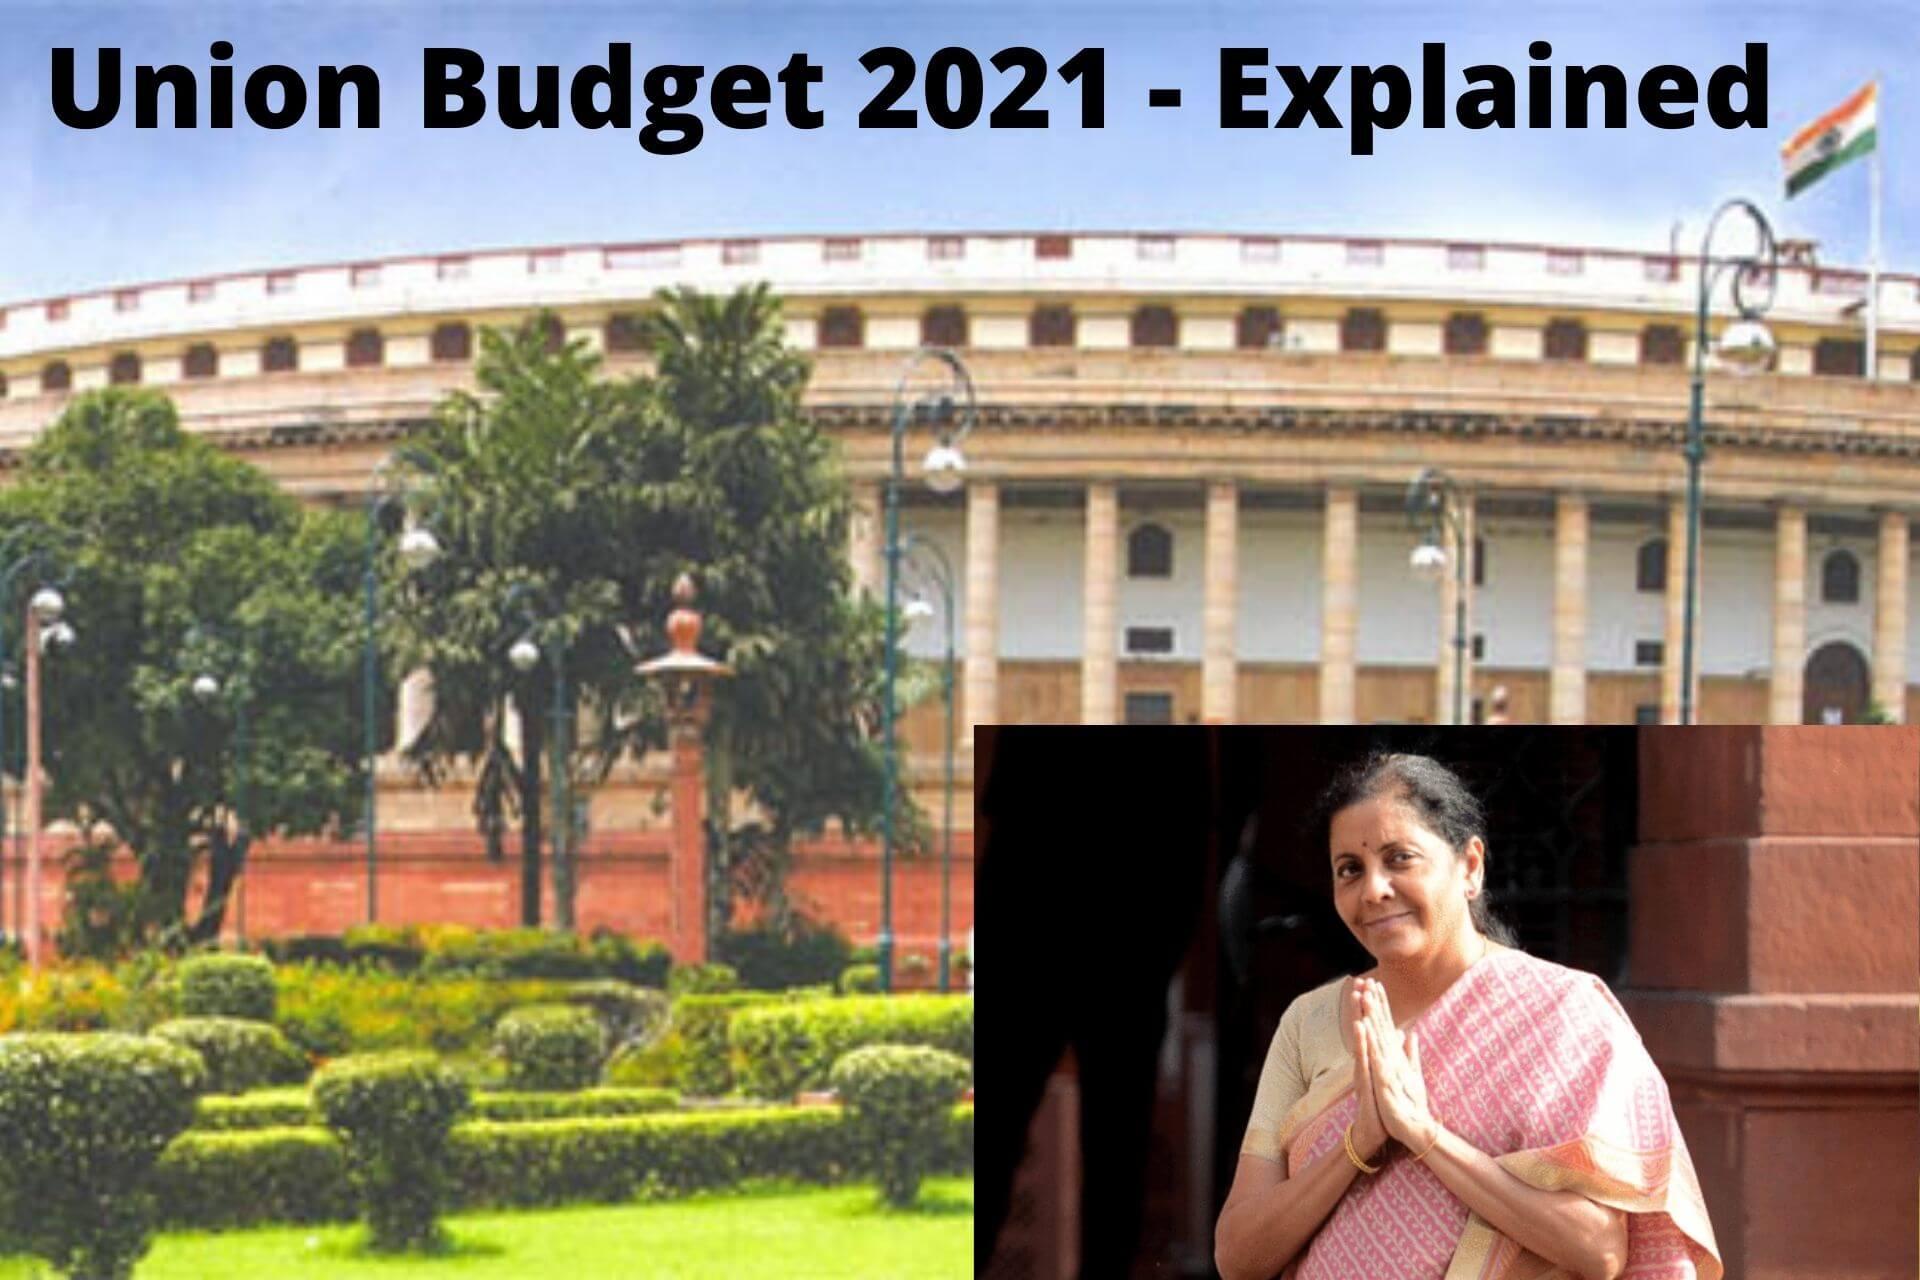 Union Budget 2021 – Detailed Explanation